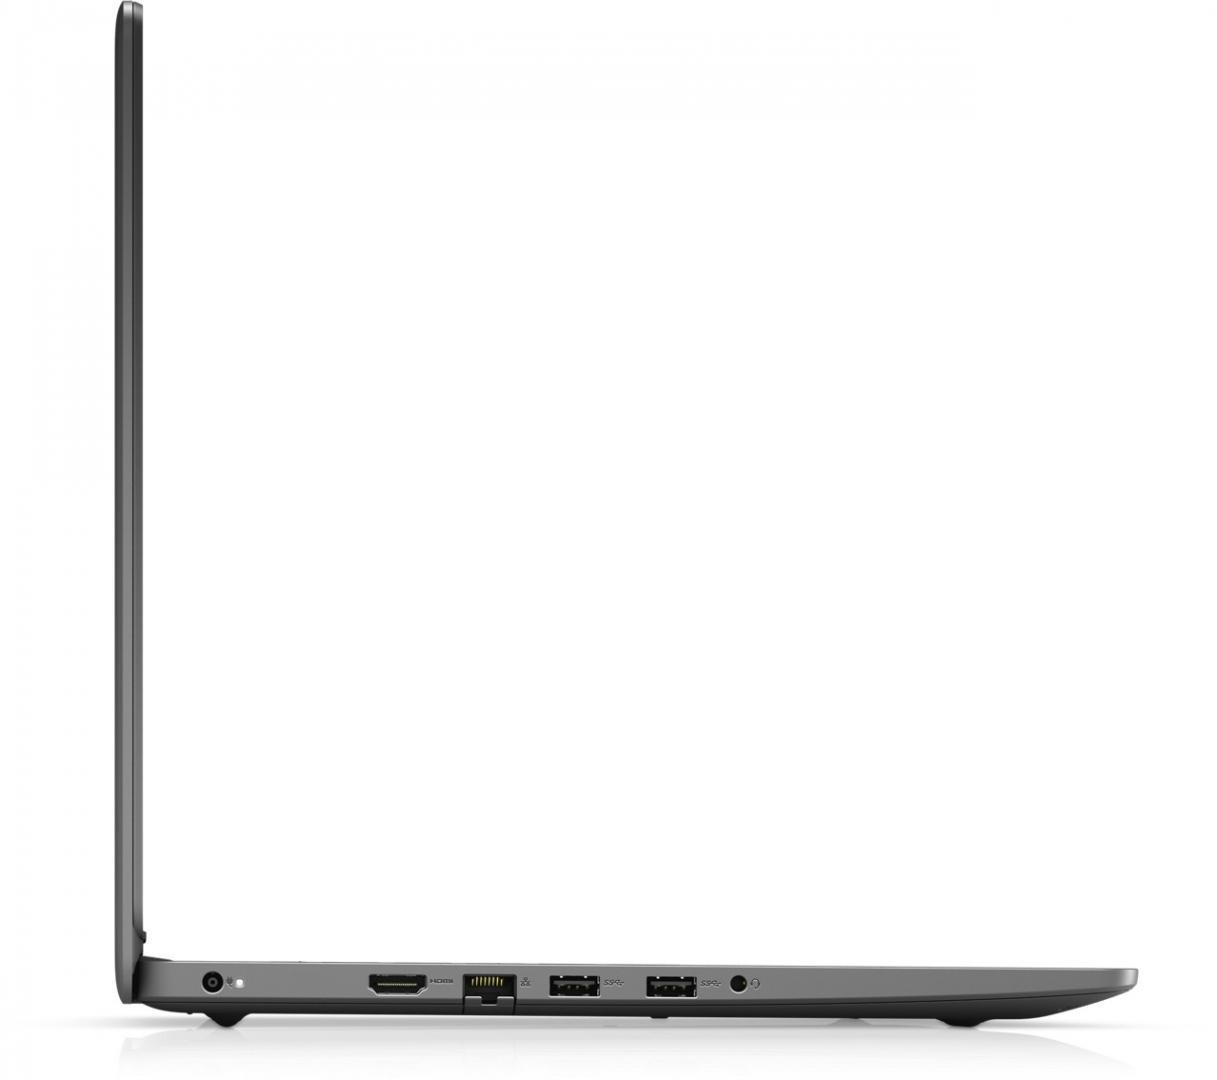 Laptop Dell Inspiron 3501, 15.6'' FHD, i3-1005G1, 8GB, 256GB SSD, Intel UHD Graphics, W10 Home S Mode - imaginea 5